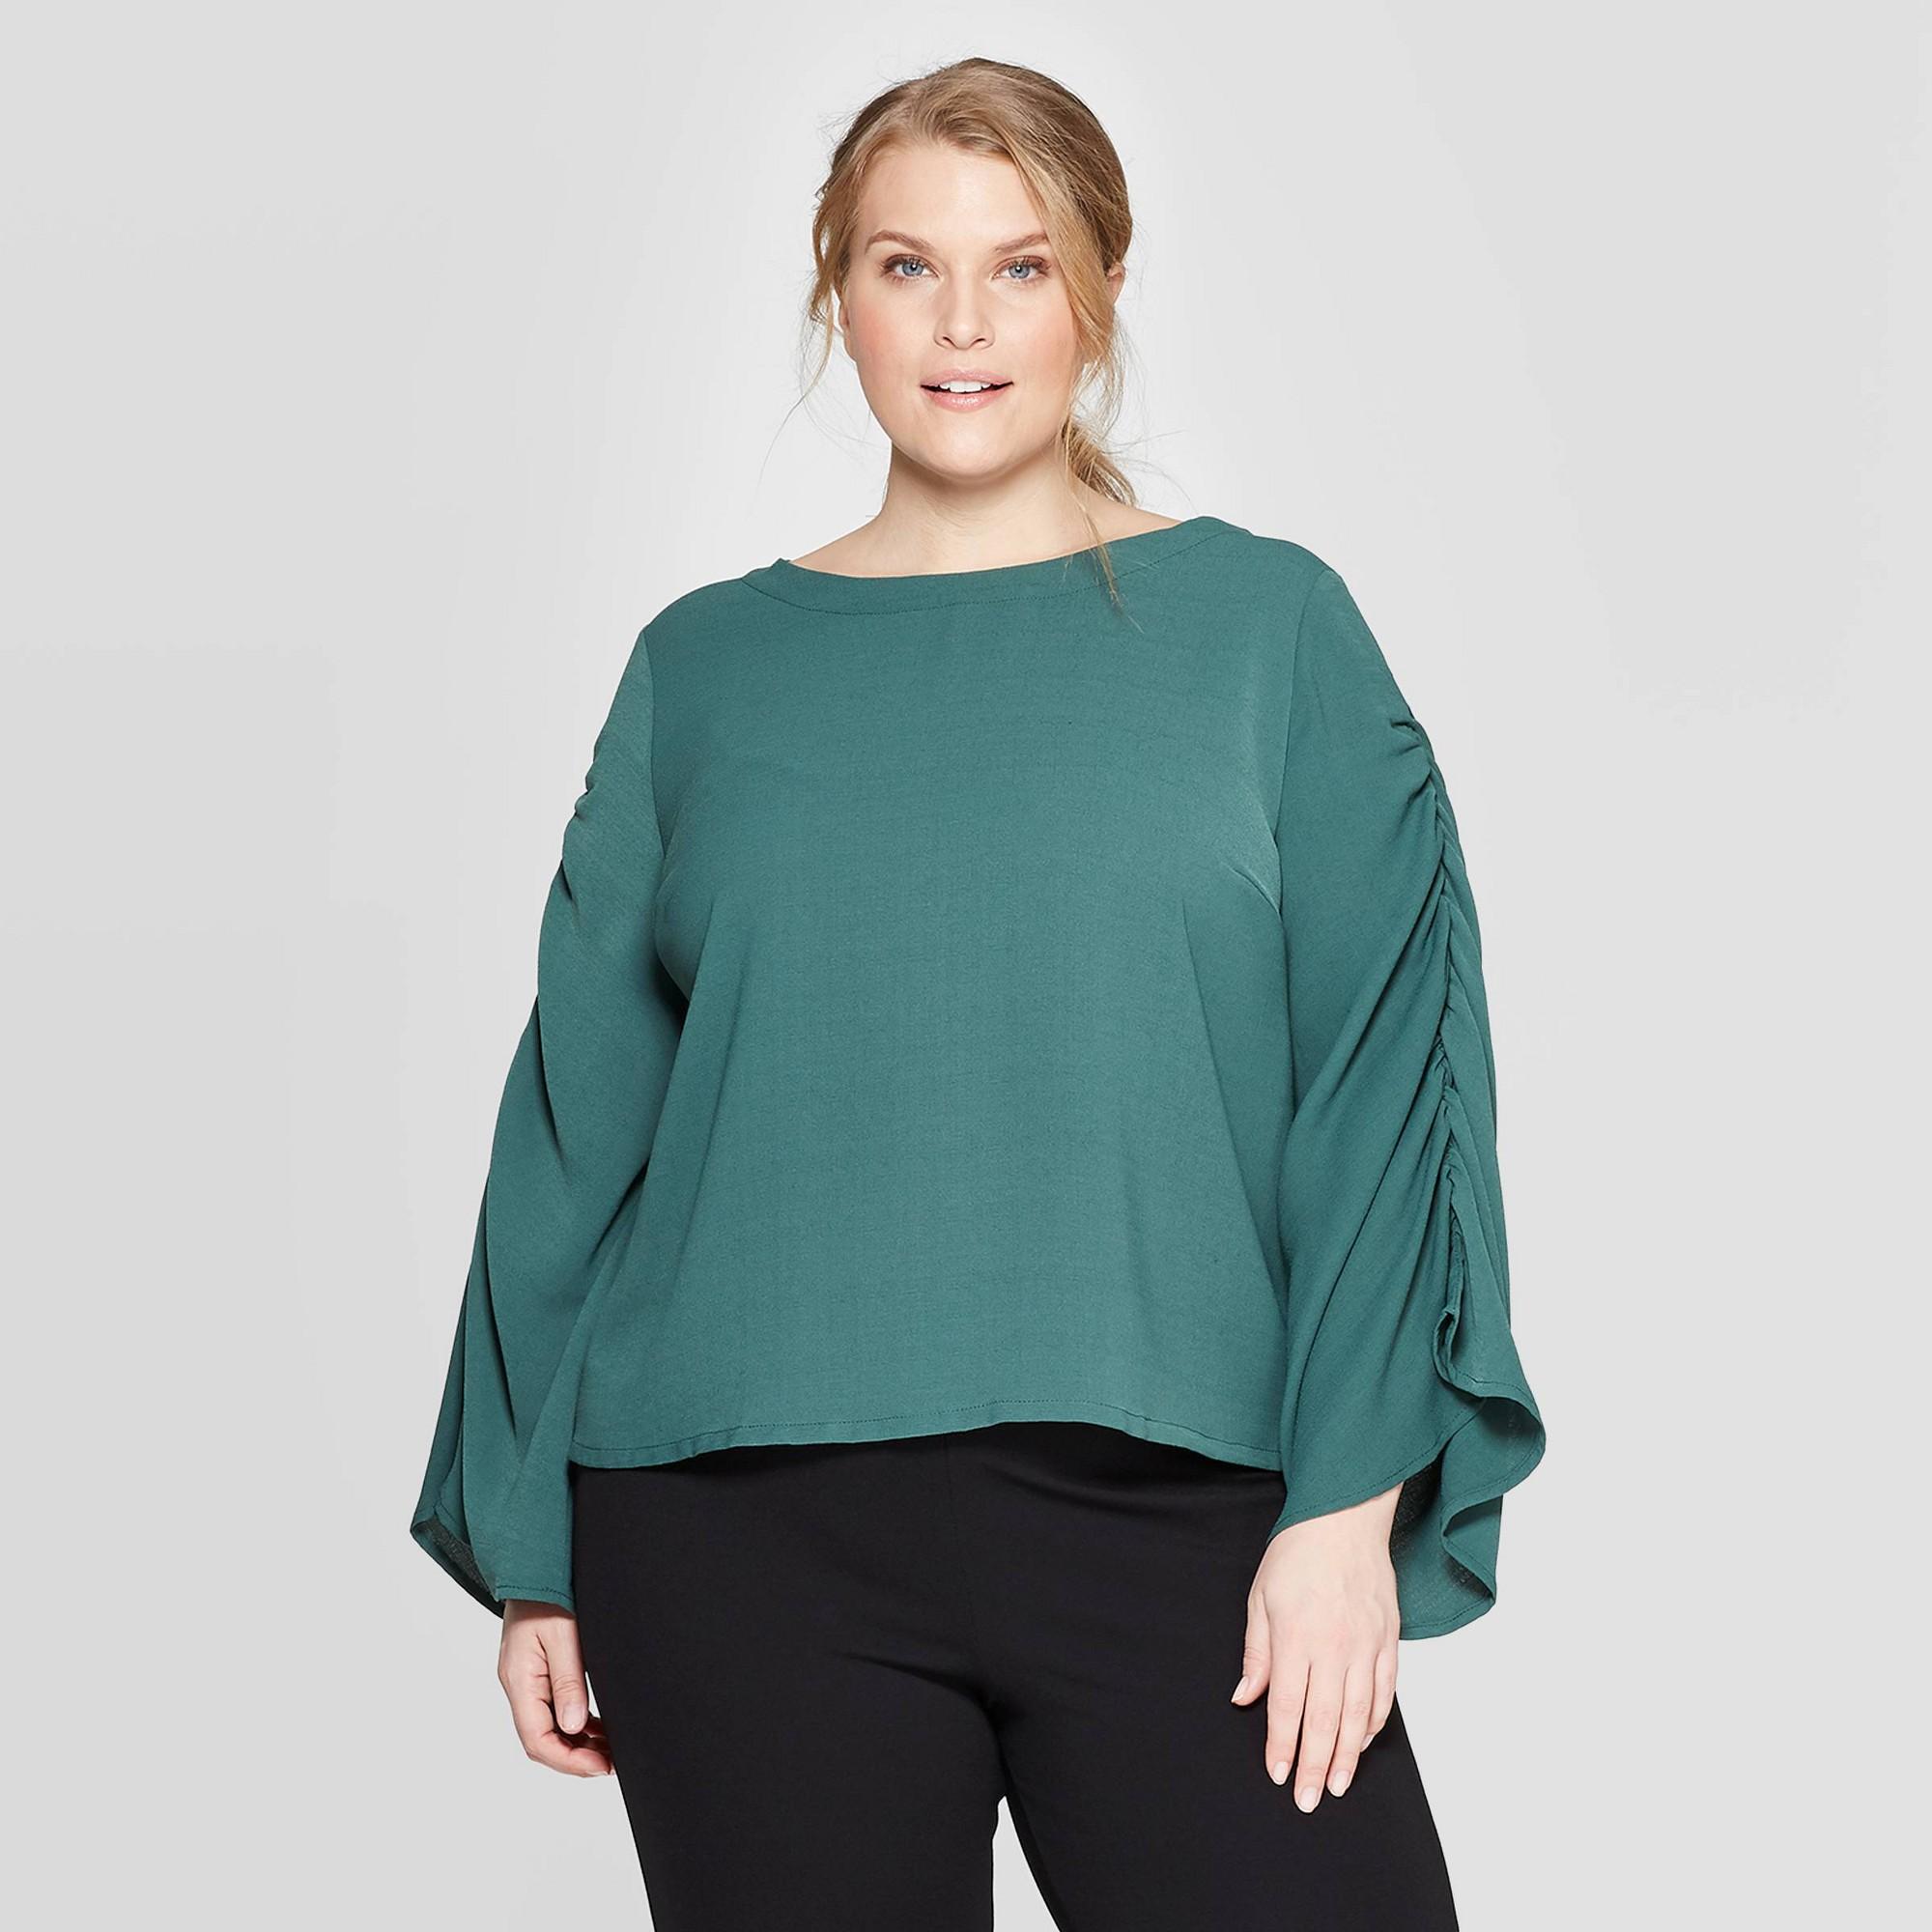 Women's Plus Size Long Sleeve Scoop Neck Top - Prologue Green 2X